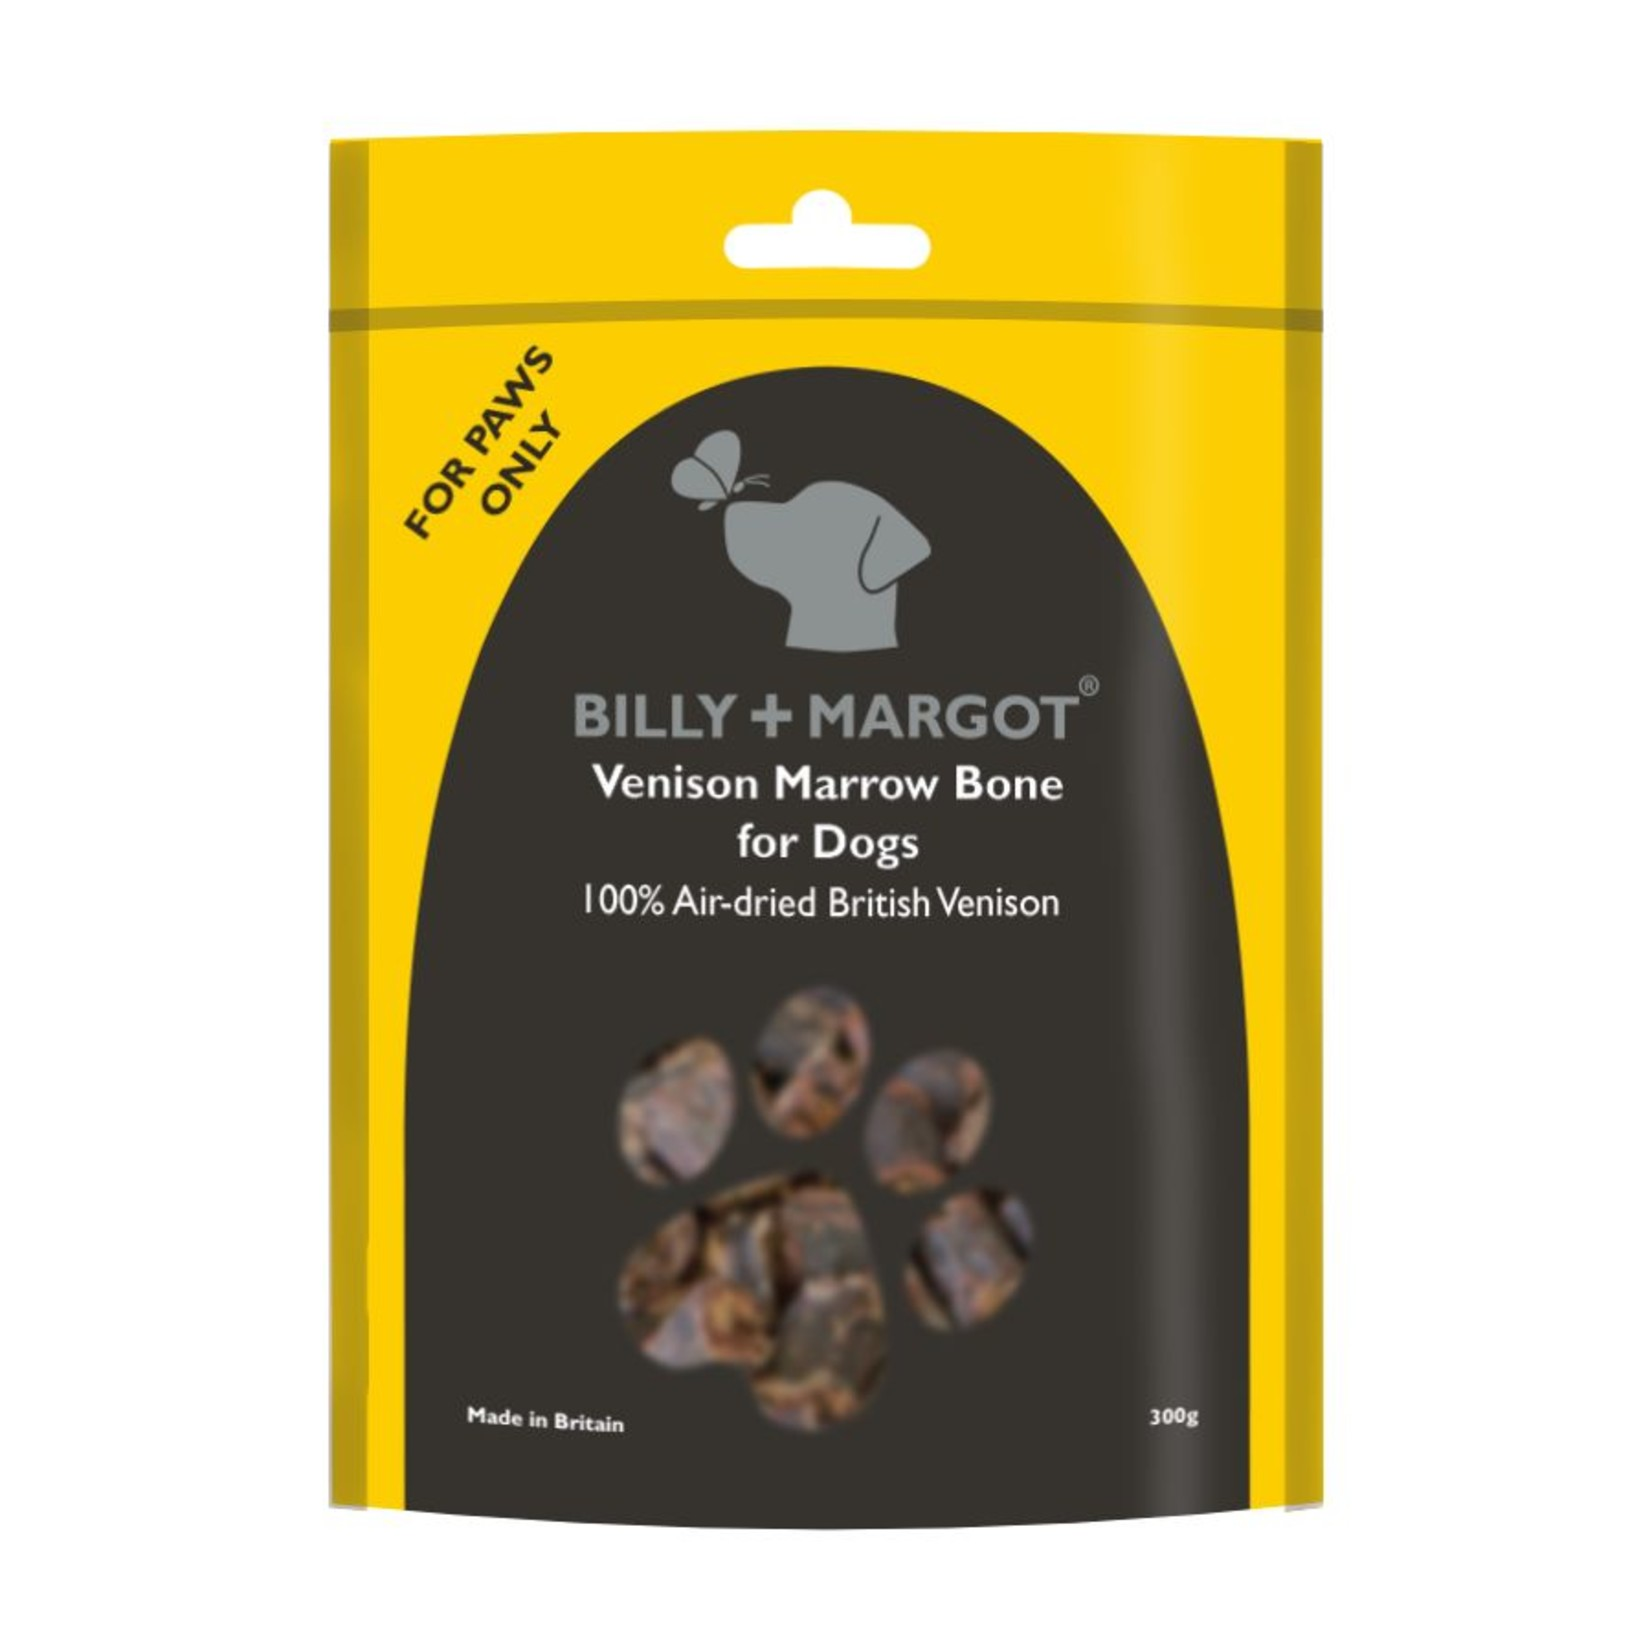 Billy + Margot Venison Marrow Bone Dog Treats, 300g